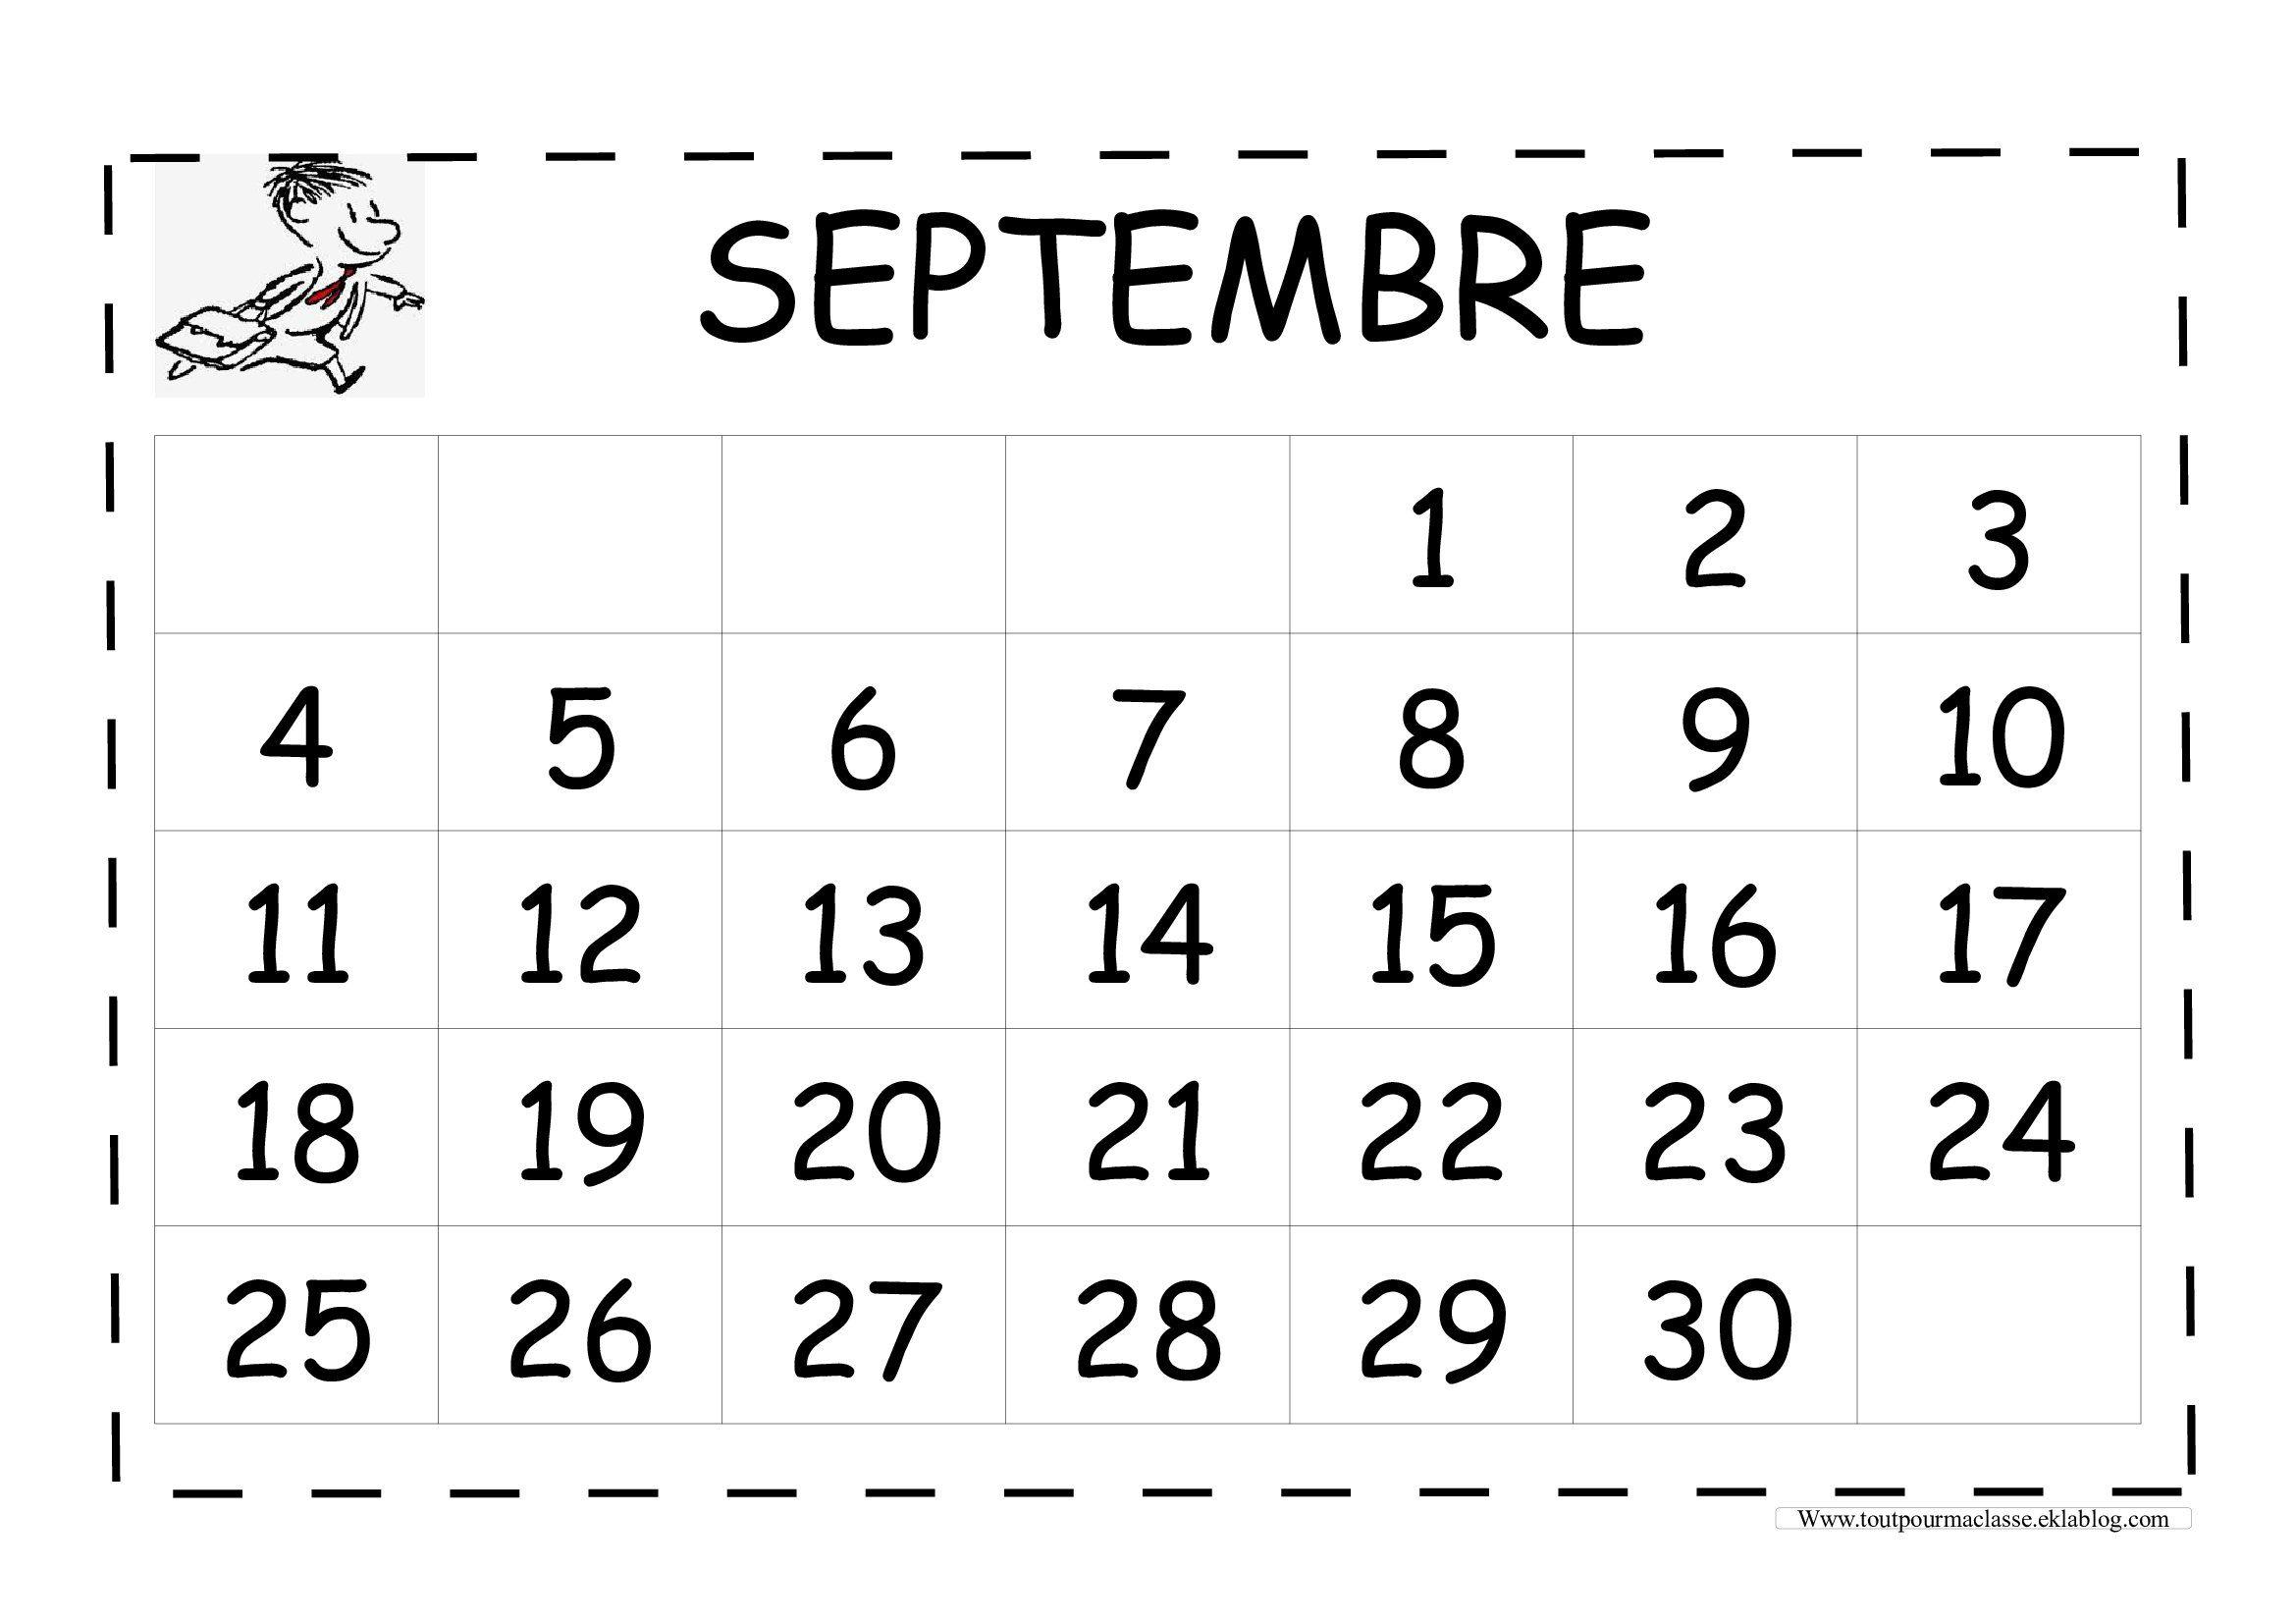 Calendrier Octobre 2020.Calendrier Mural 2019 2020 Calendrier Octobre